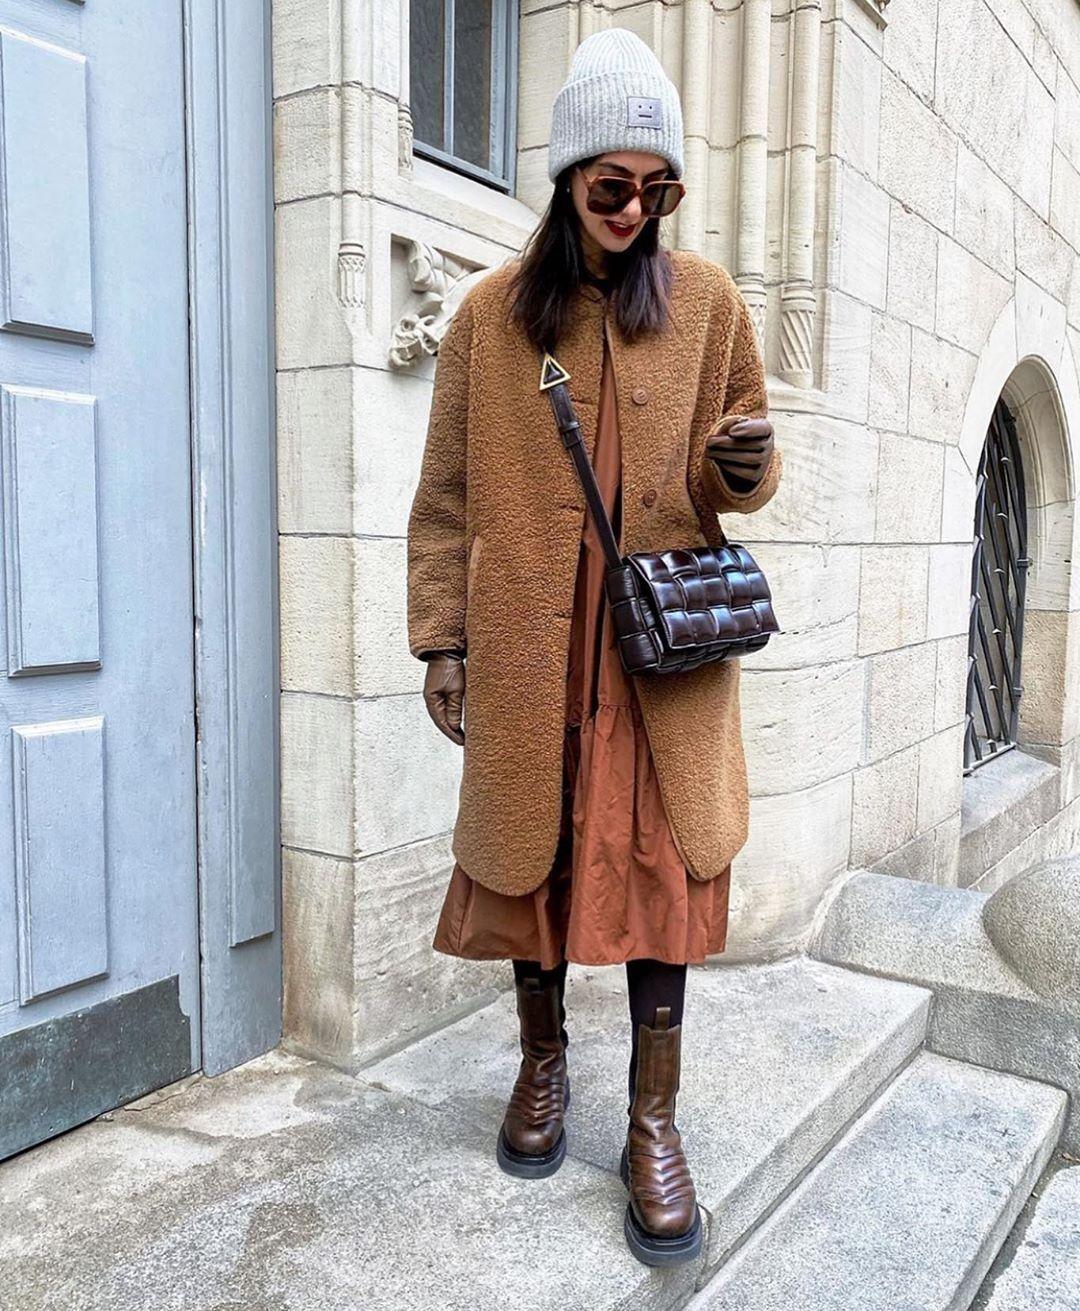 manteau effet mouton de Zara sur zara.mania